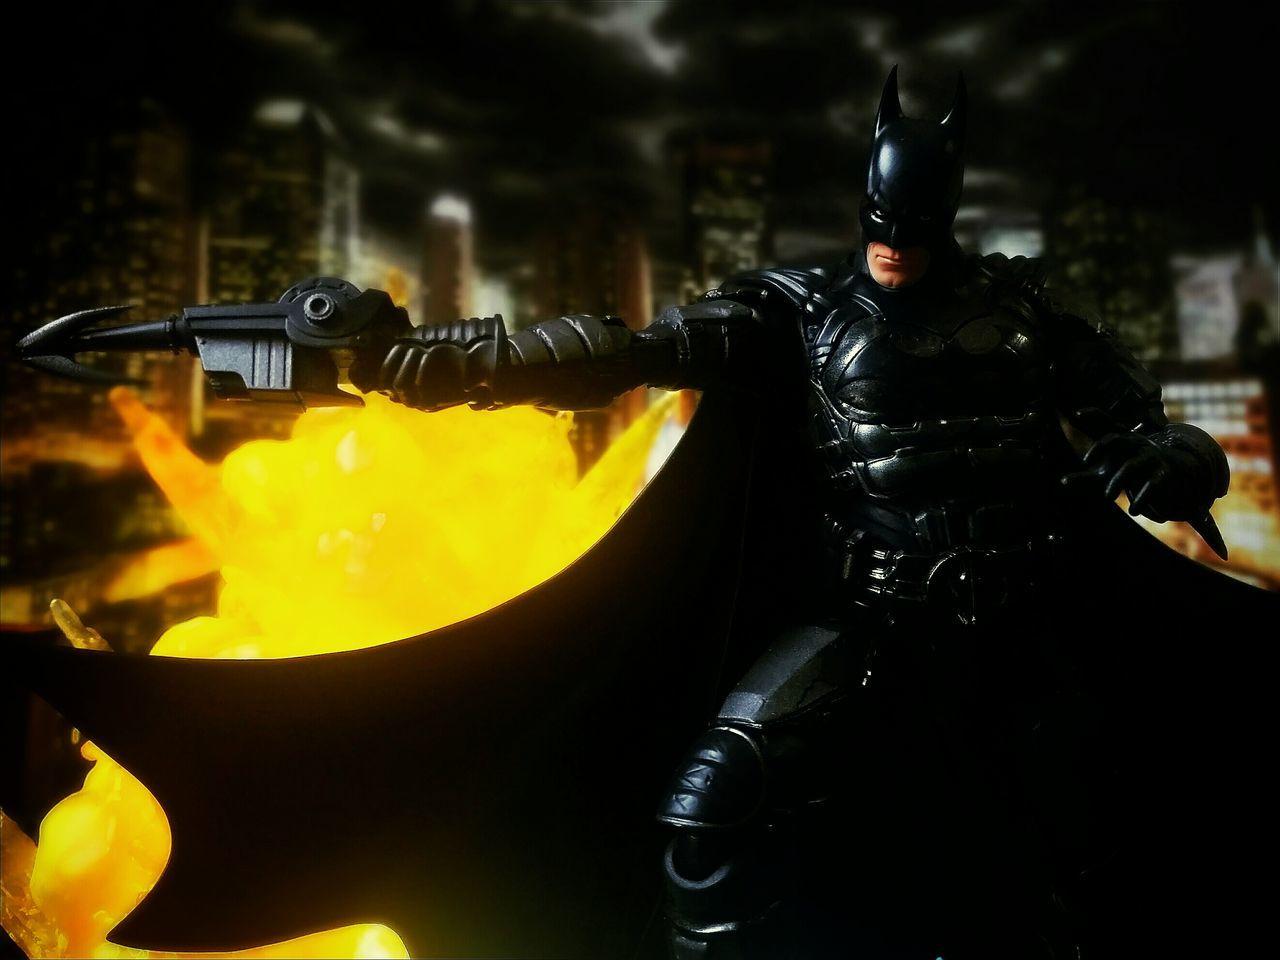 I'm Batman Dccomics Injustice Shf Sh Figuarts Tamashiinations BANDAI Action Figures Toys Toy Photography Toyphotography Actionfigures Batman Heroes Super Heroes